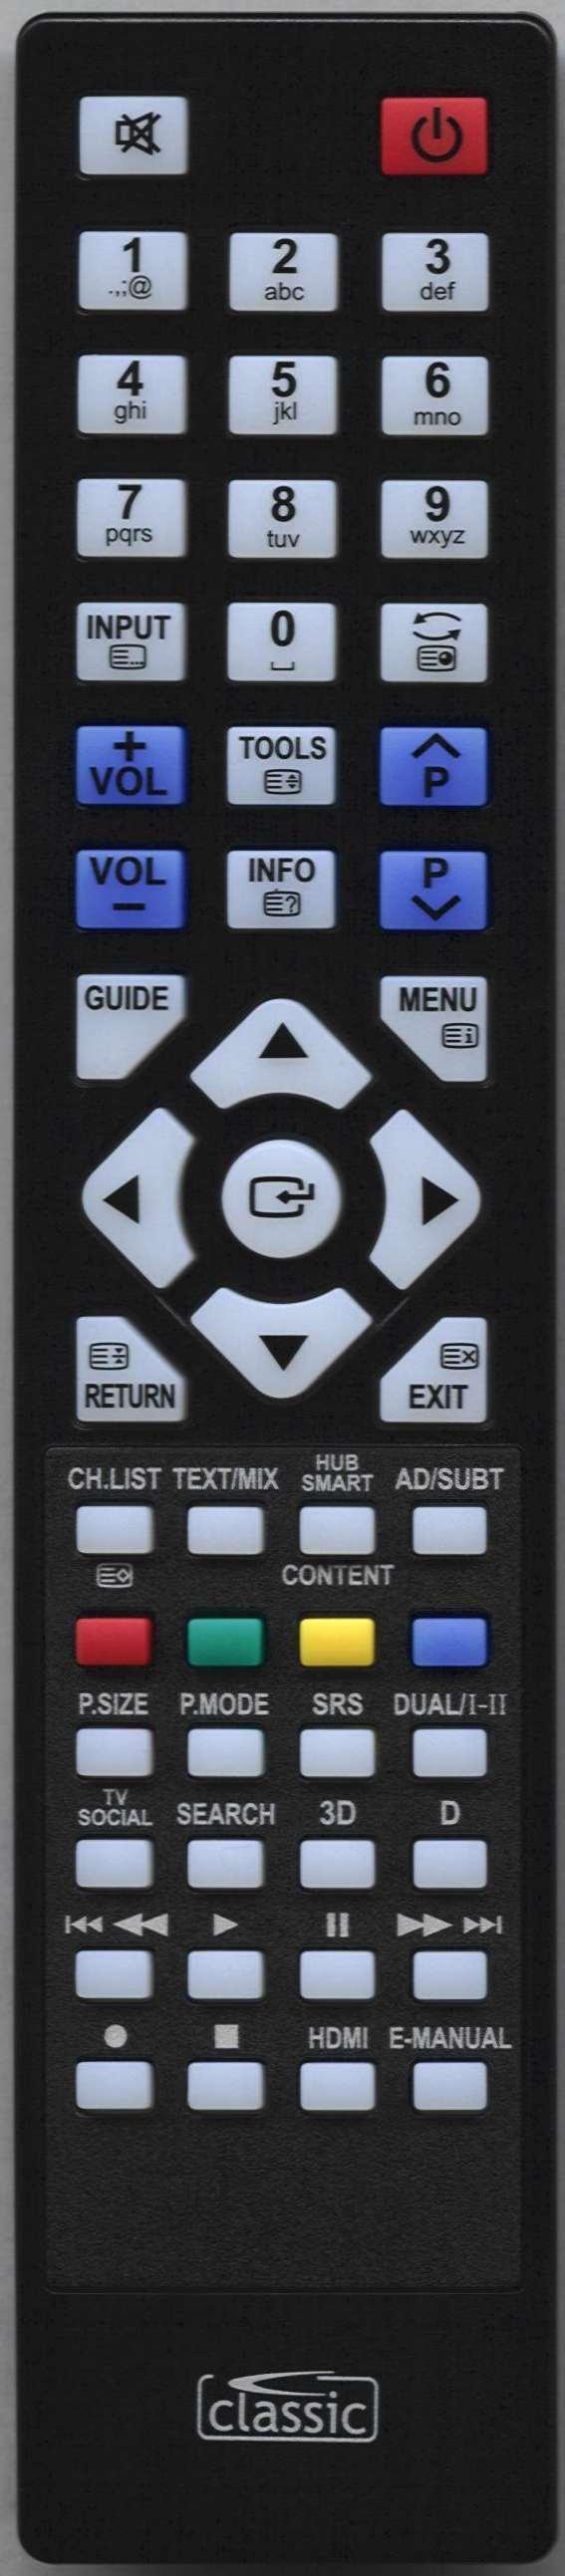 SAMSUNG UE32D4003BW Remote Control Alternative